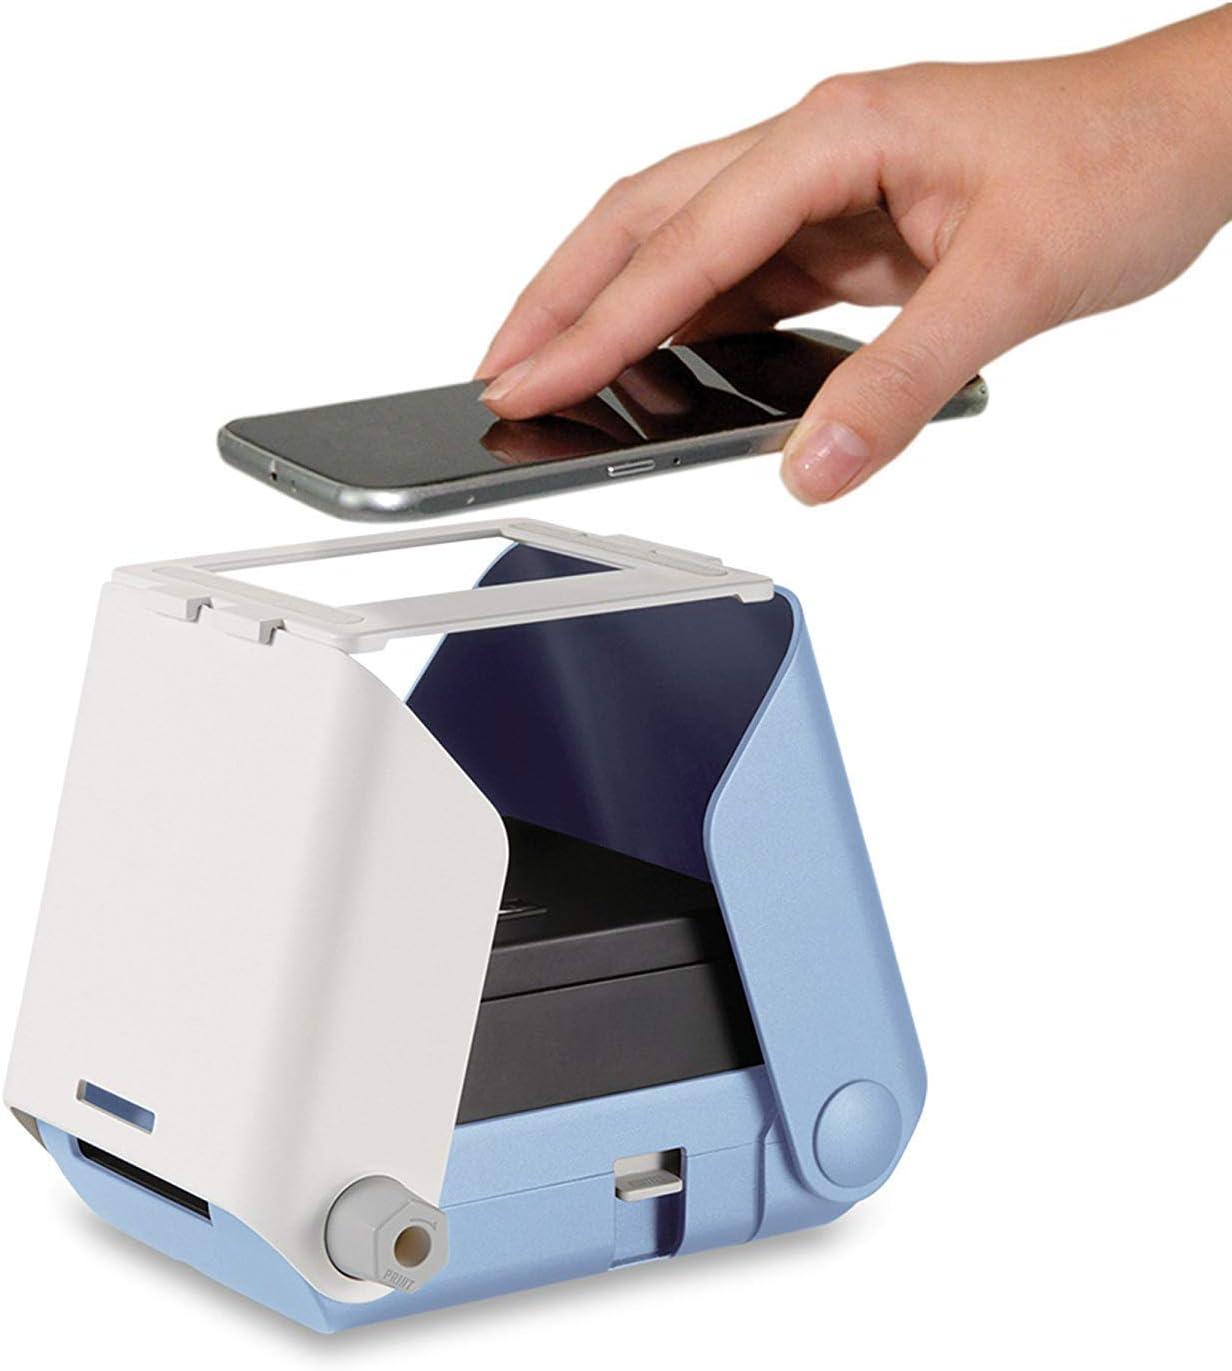 10 Fotos Azul Kiipix Tm3364 Kit Impresora Fotográfica Para Smartphone Con Protector De Pantalla De Fujifilm Instax Mini Impresoras Láser Y De Tinta Unifytulum Informática